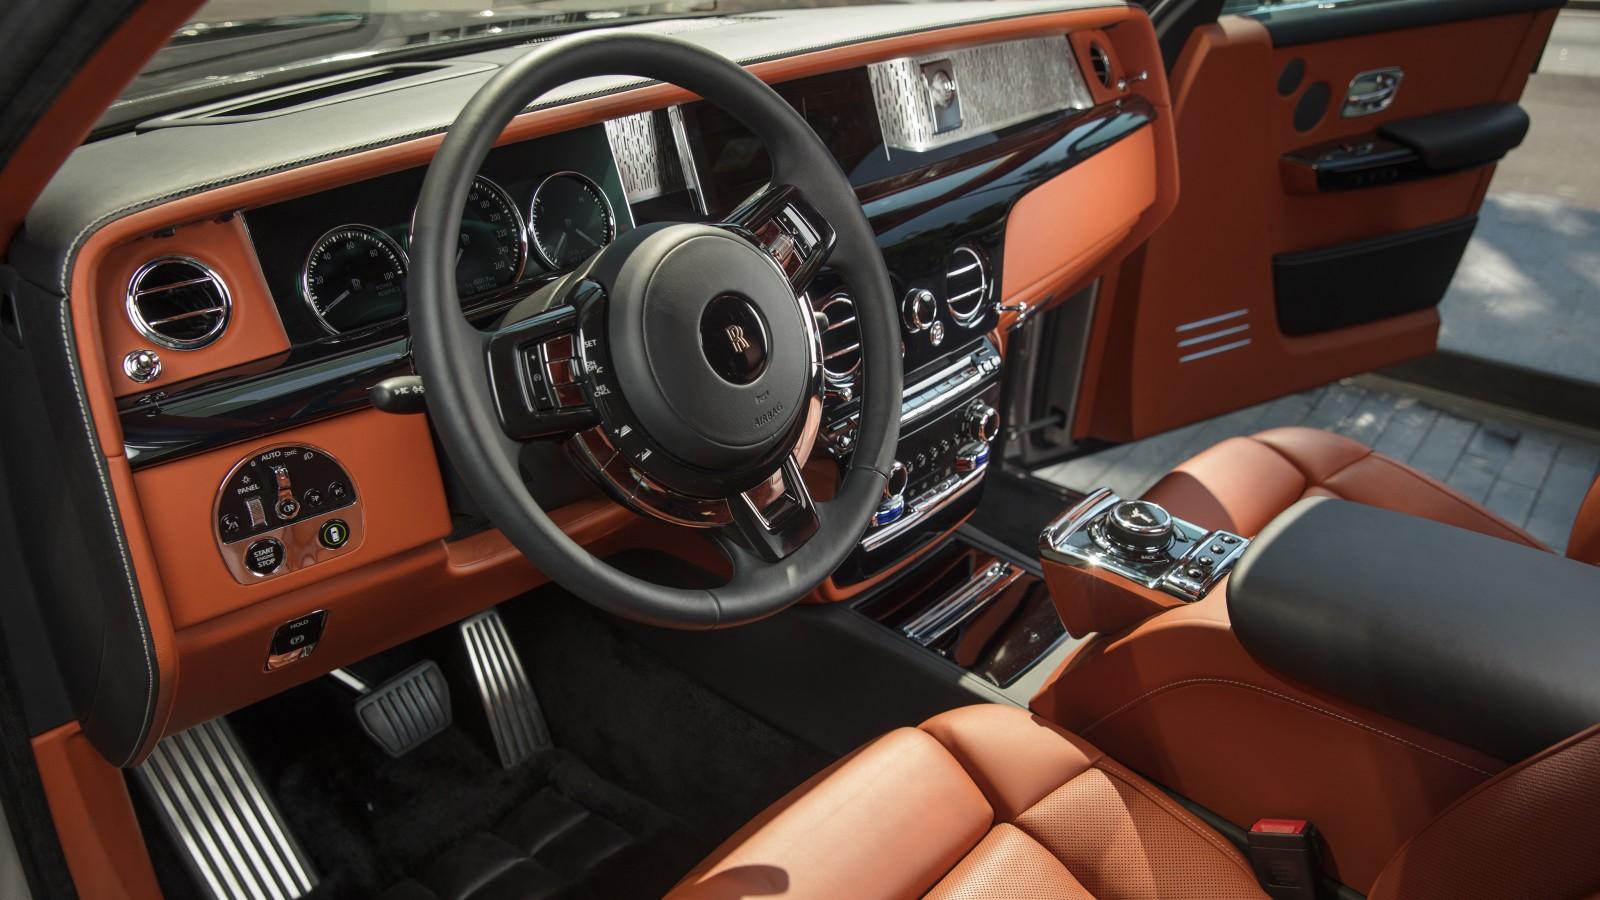 2018 Rolls Royce Phantom 4K Interior Wallpaper | HD Car Wallpapers | ID #8754